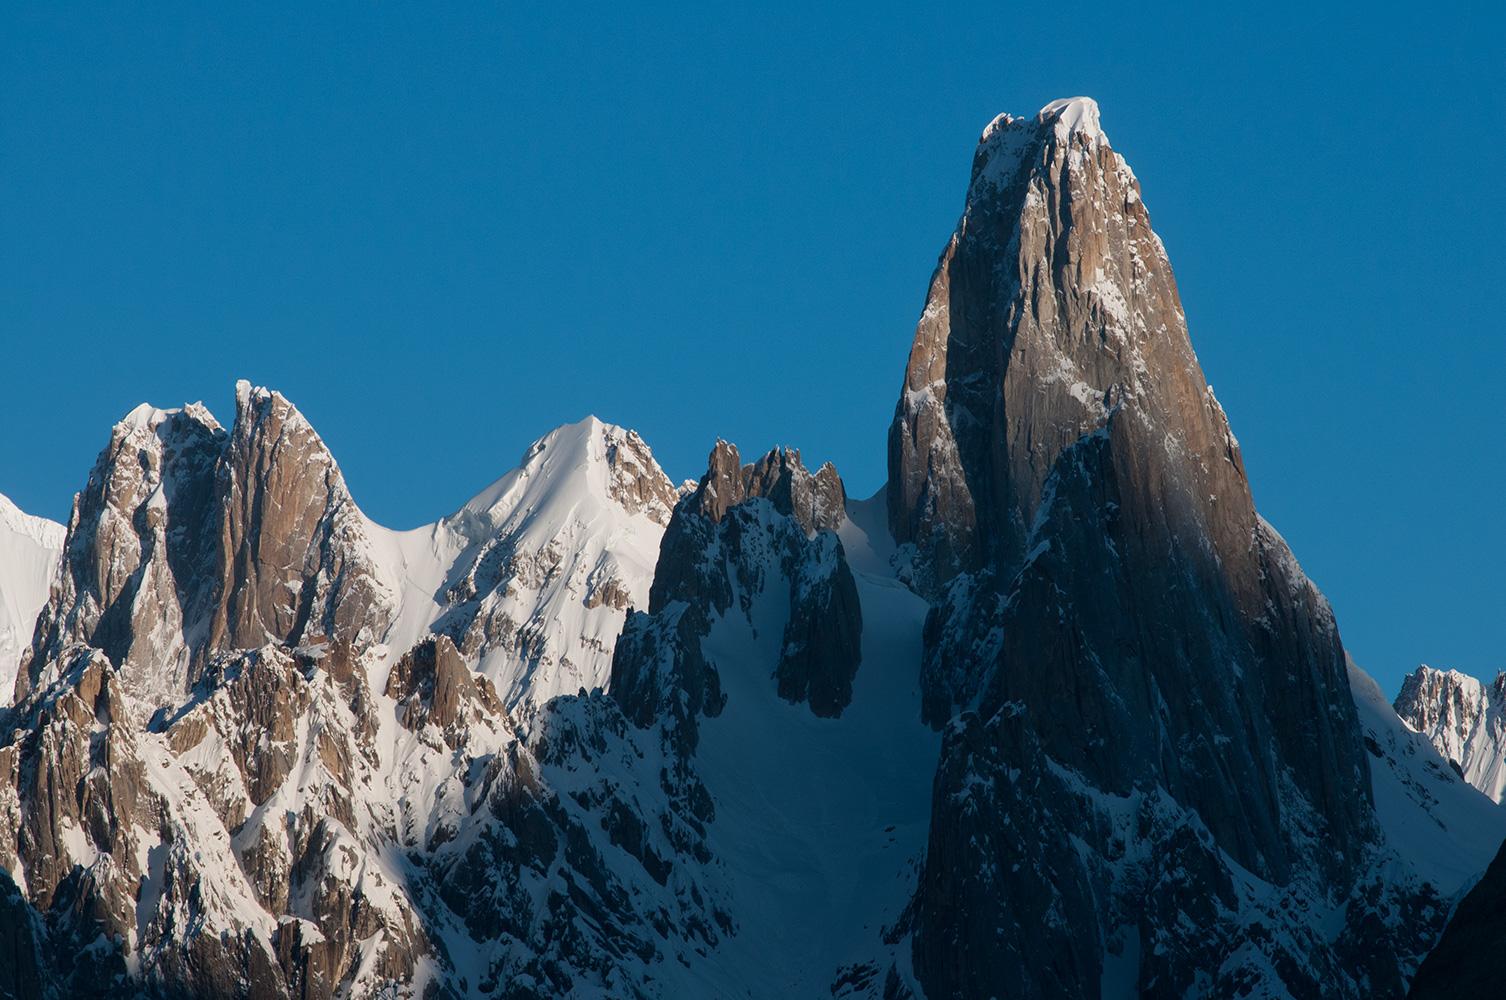 An early morning telephoto from Hobutse on the Baltoro glacier